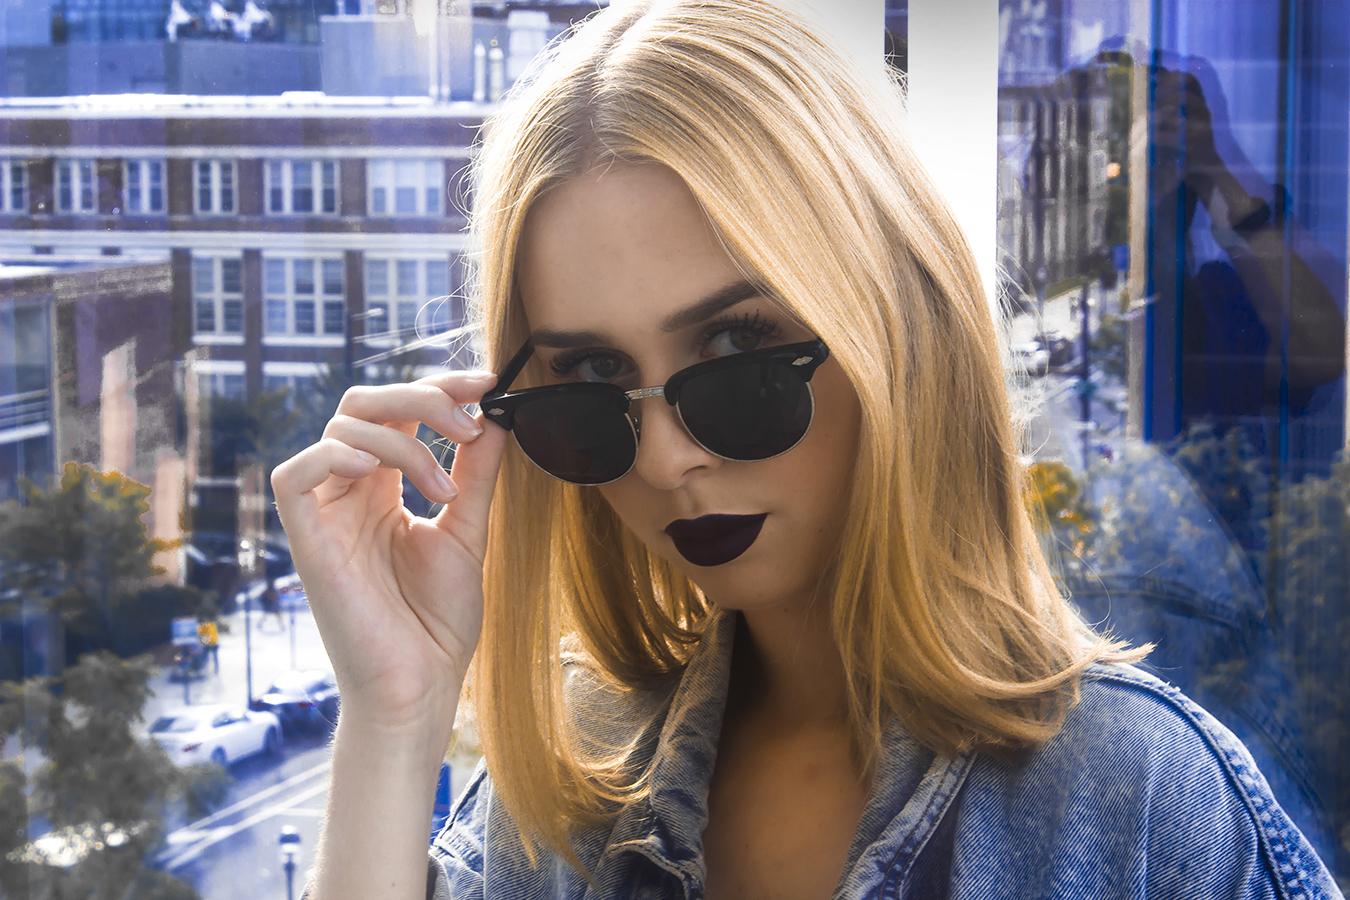 RIA_VAIDYA_photography_fashion_tony_ward_studio_leather_jacket_dark_sunglasses_dark_lips_denim